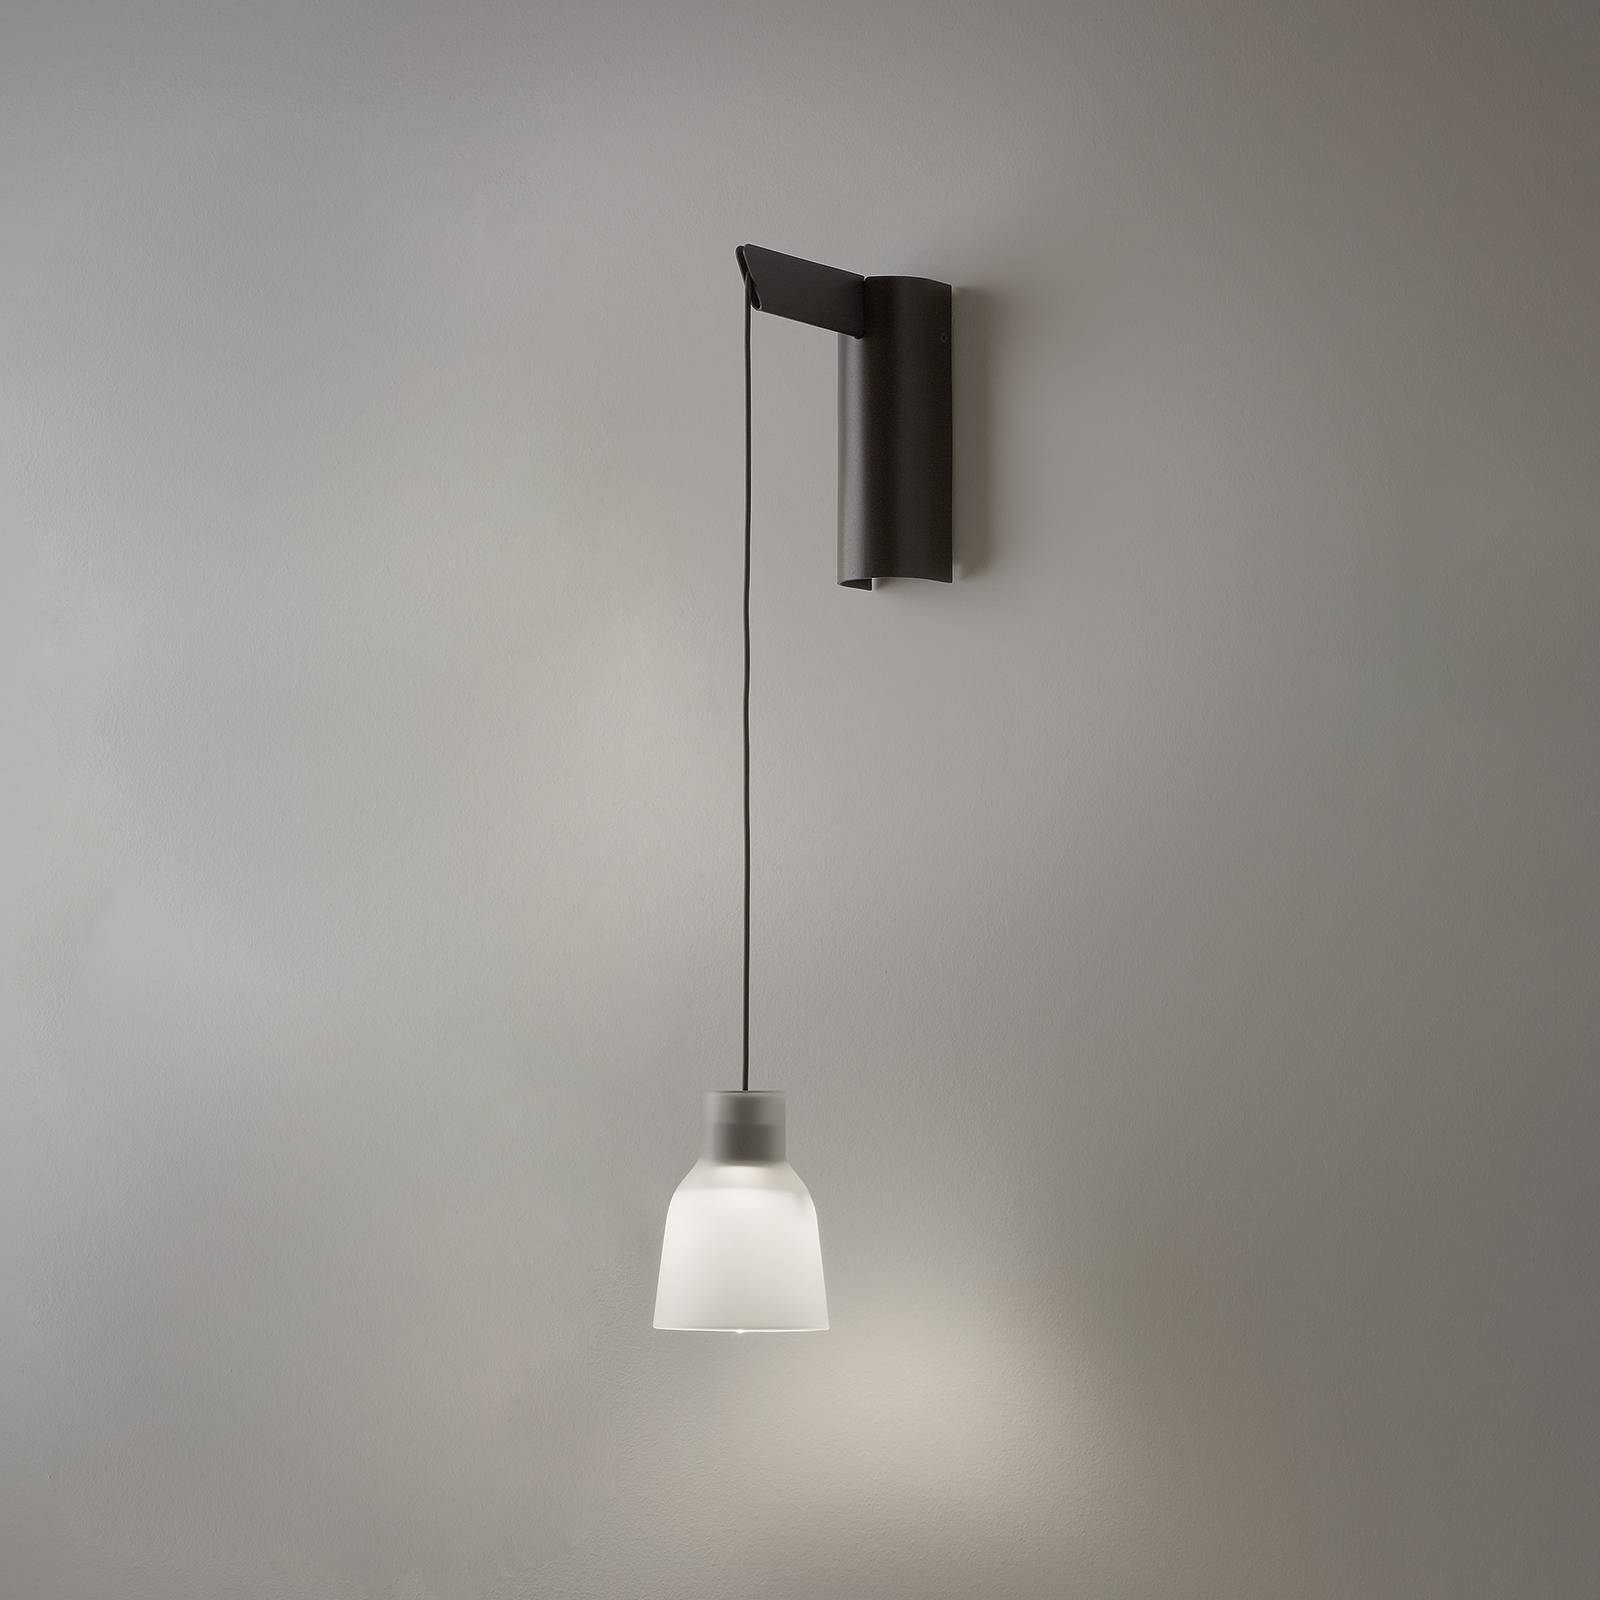 Bover Drip A/01 LED-seinävalaisin, valkoinen